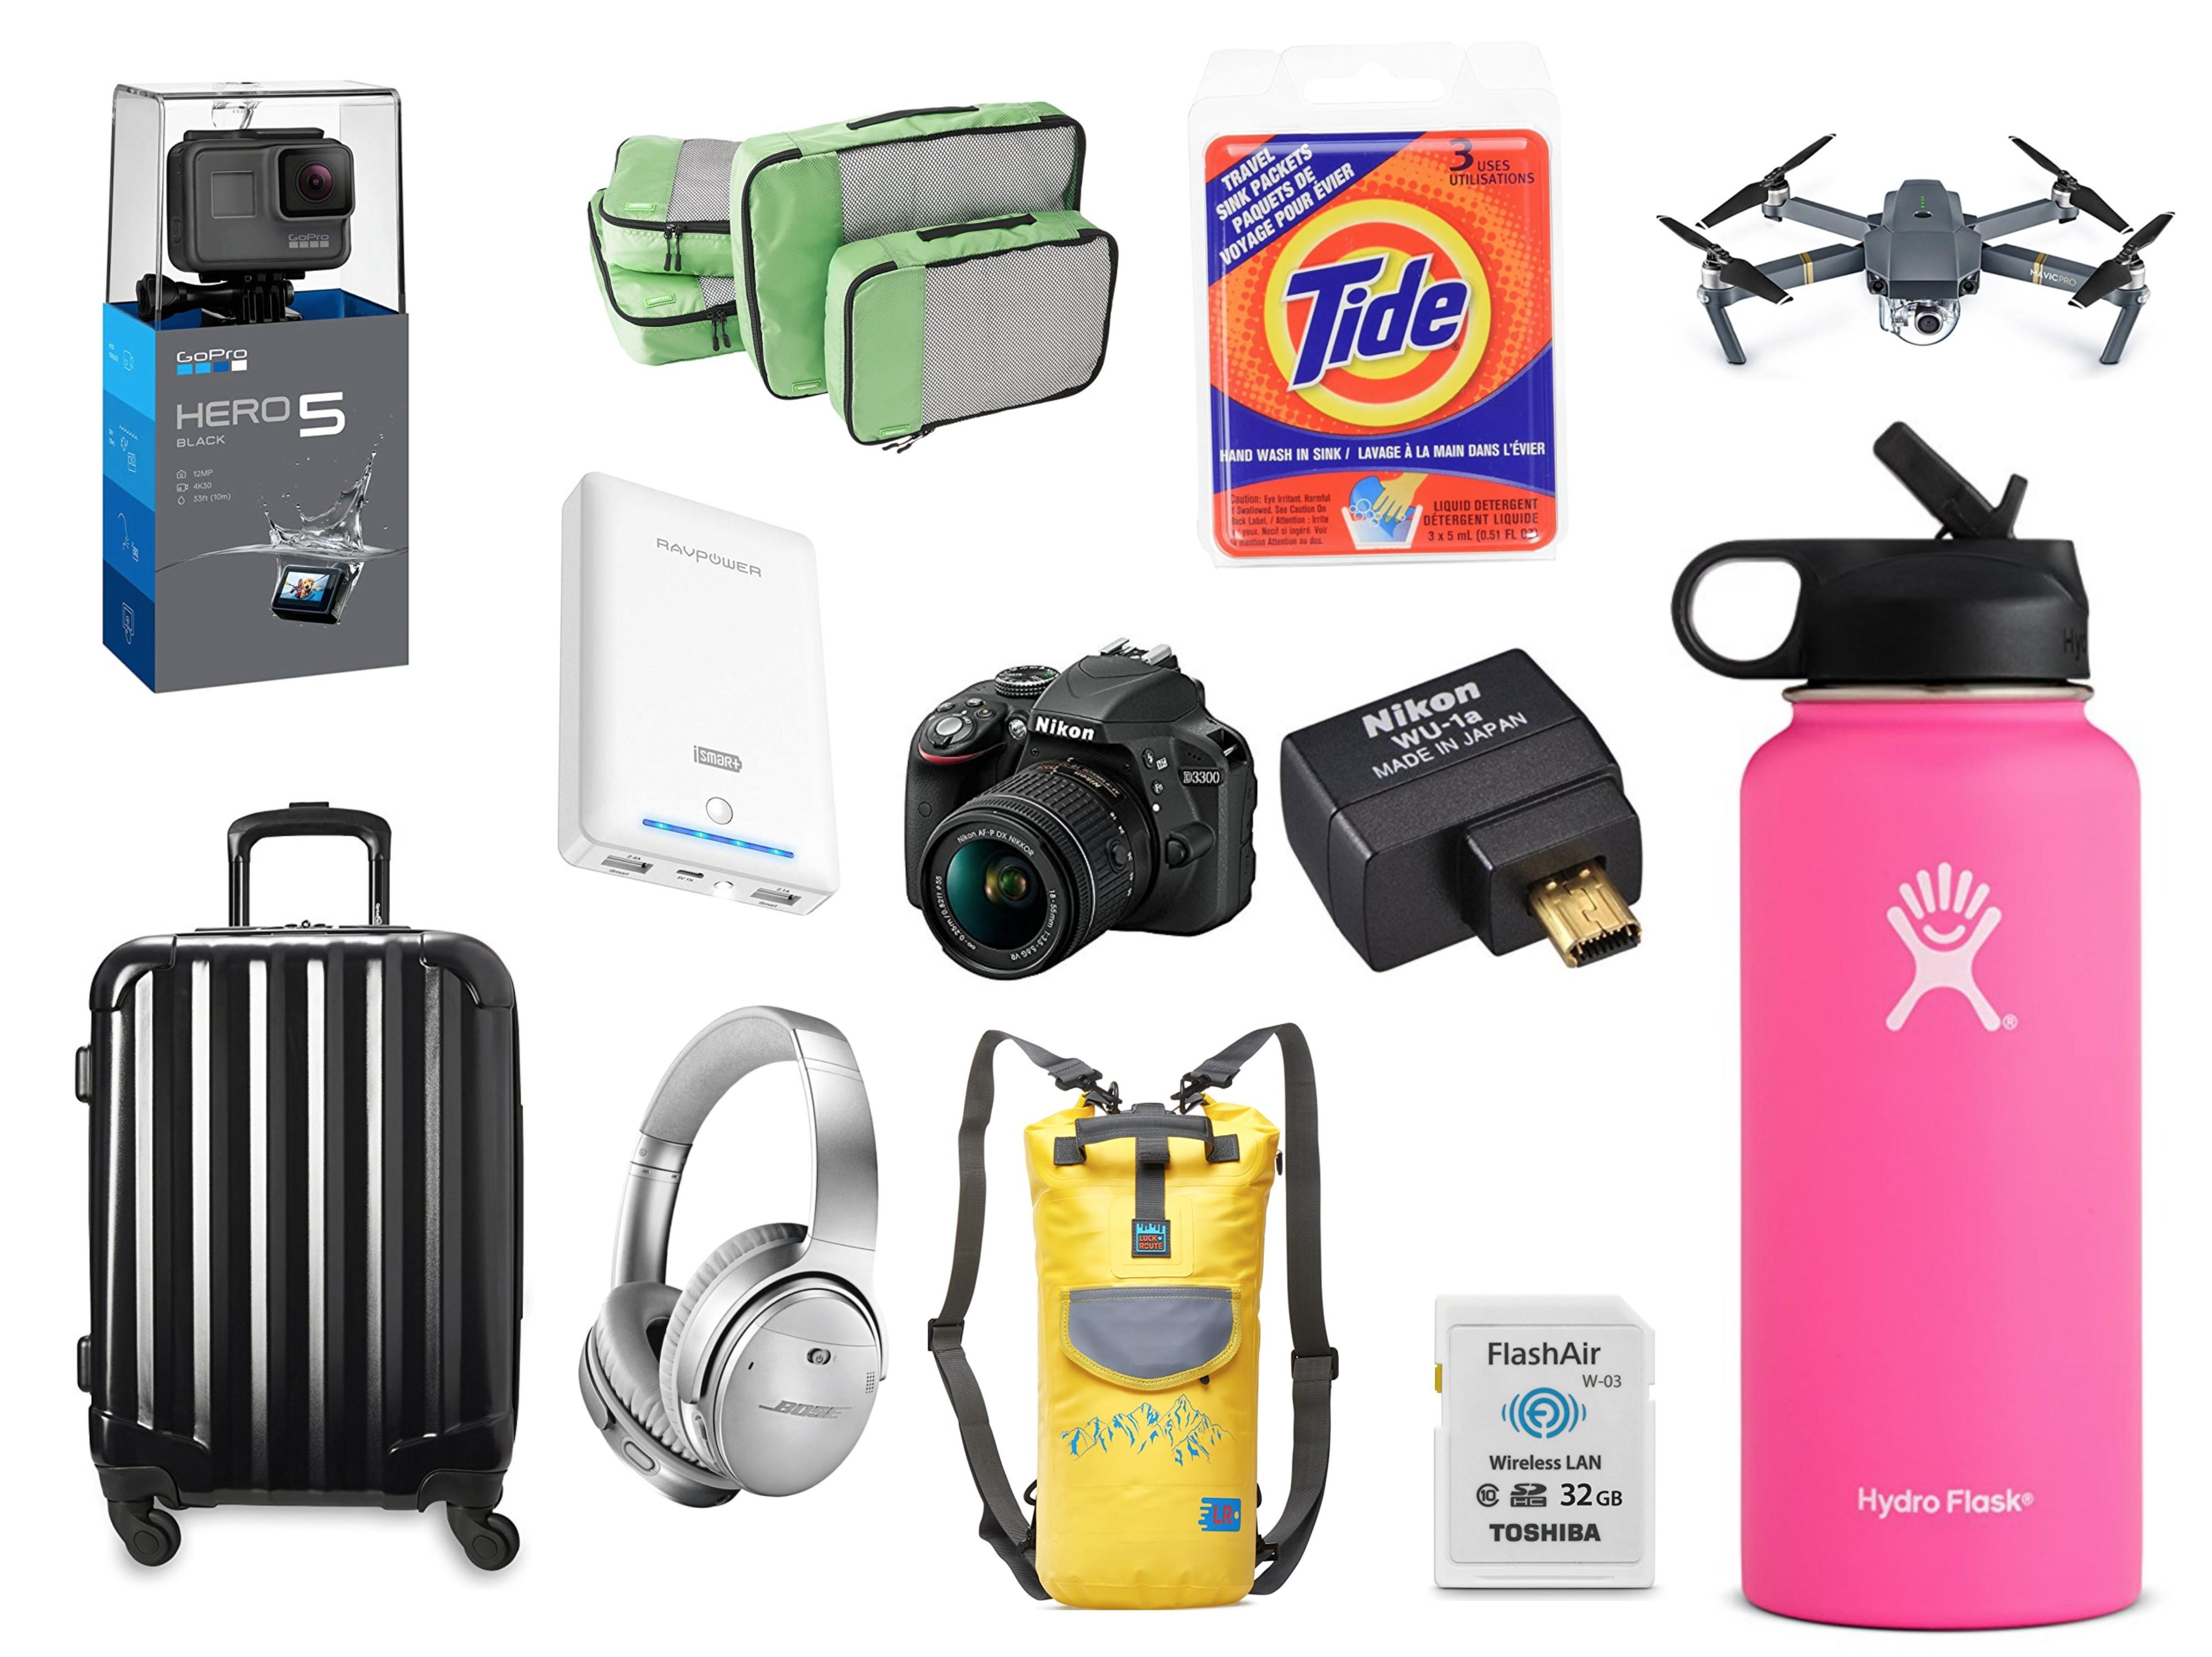 Travel Accessories I Actually Use - Travel Hacks - Travel Accessories - International Travel Must Haves - Communikait by Kait Hanson #travel #travelhacks #wanderlust #travelaccessories